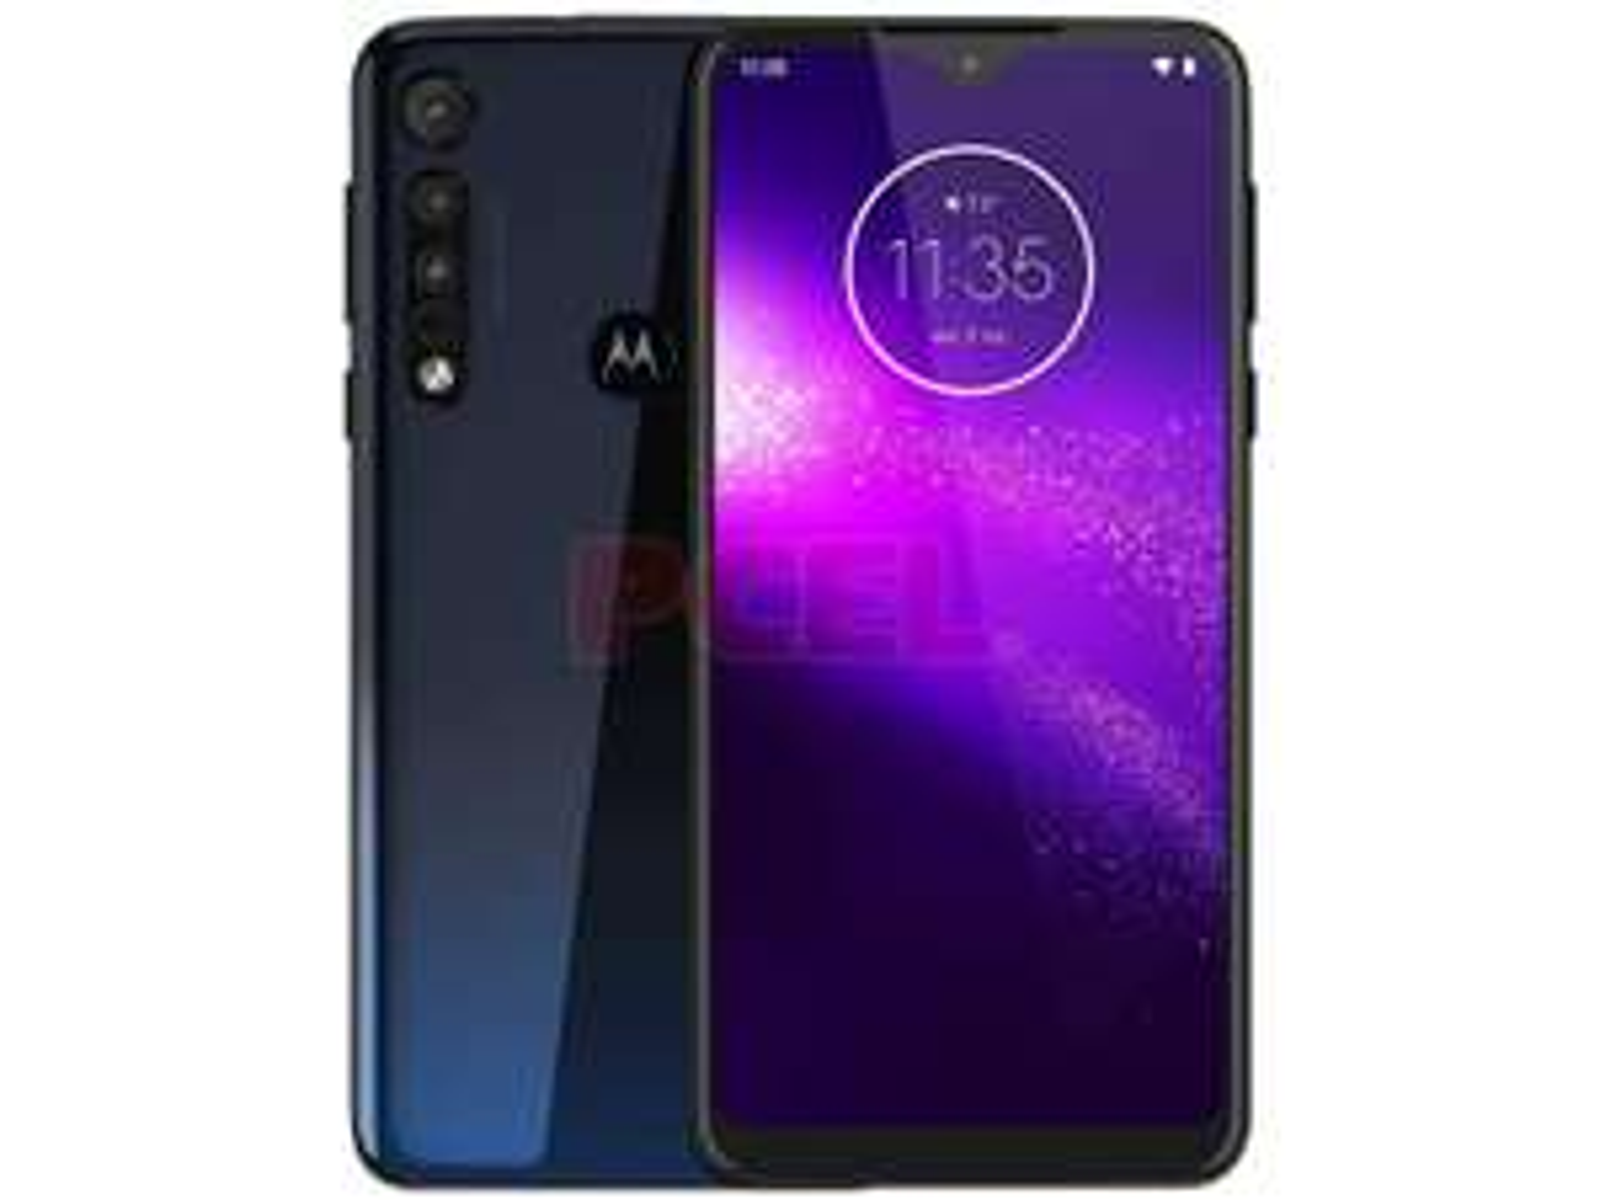 Pcel: Motorola One Macro 4gb 64gb MediaTek Helio P70 Octa Core (2.0 GHz)